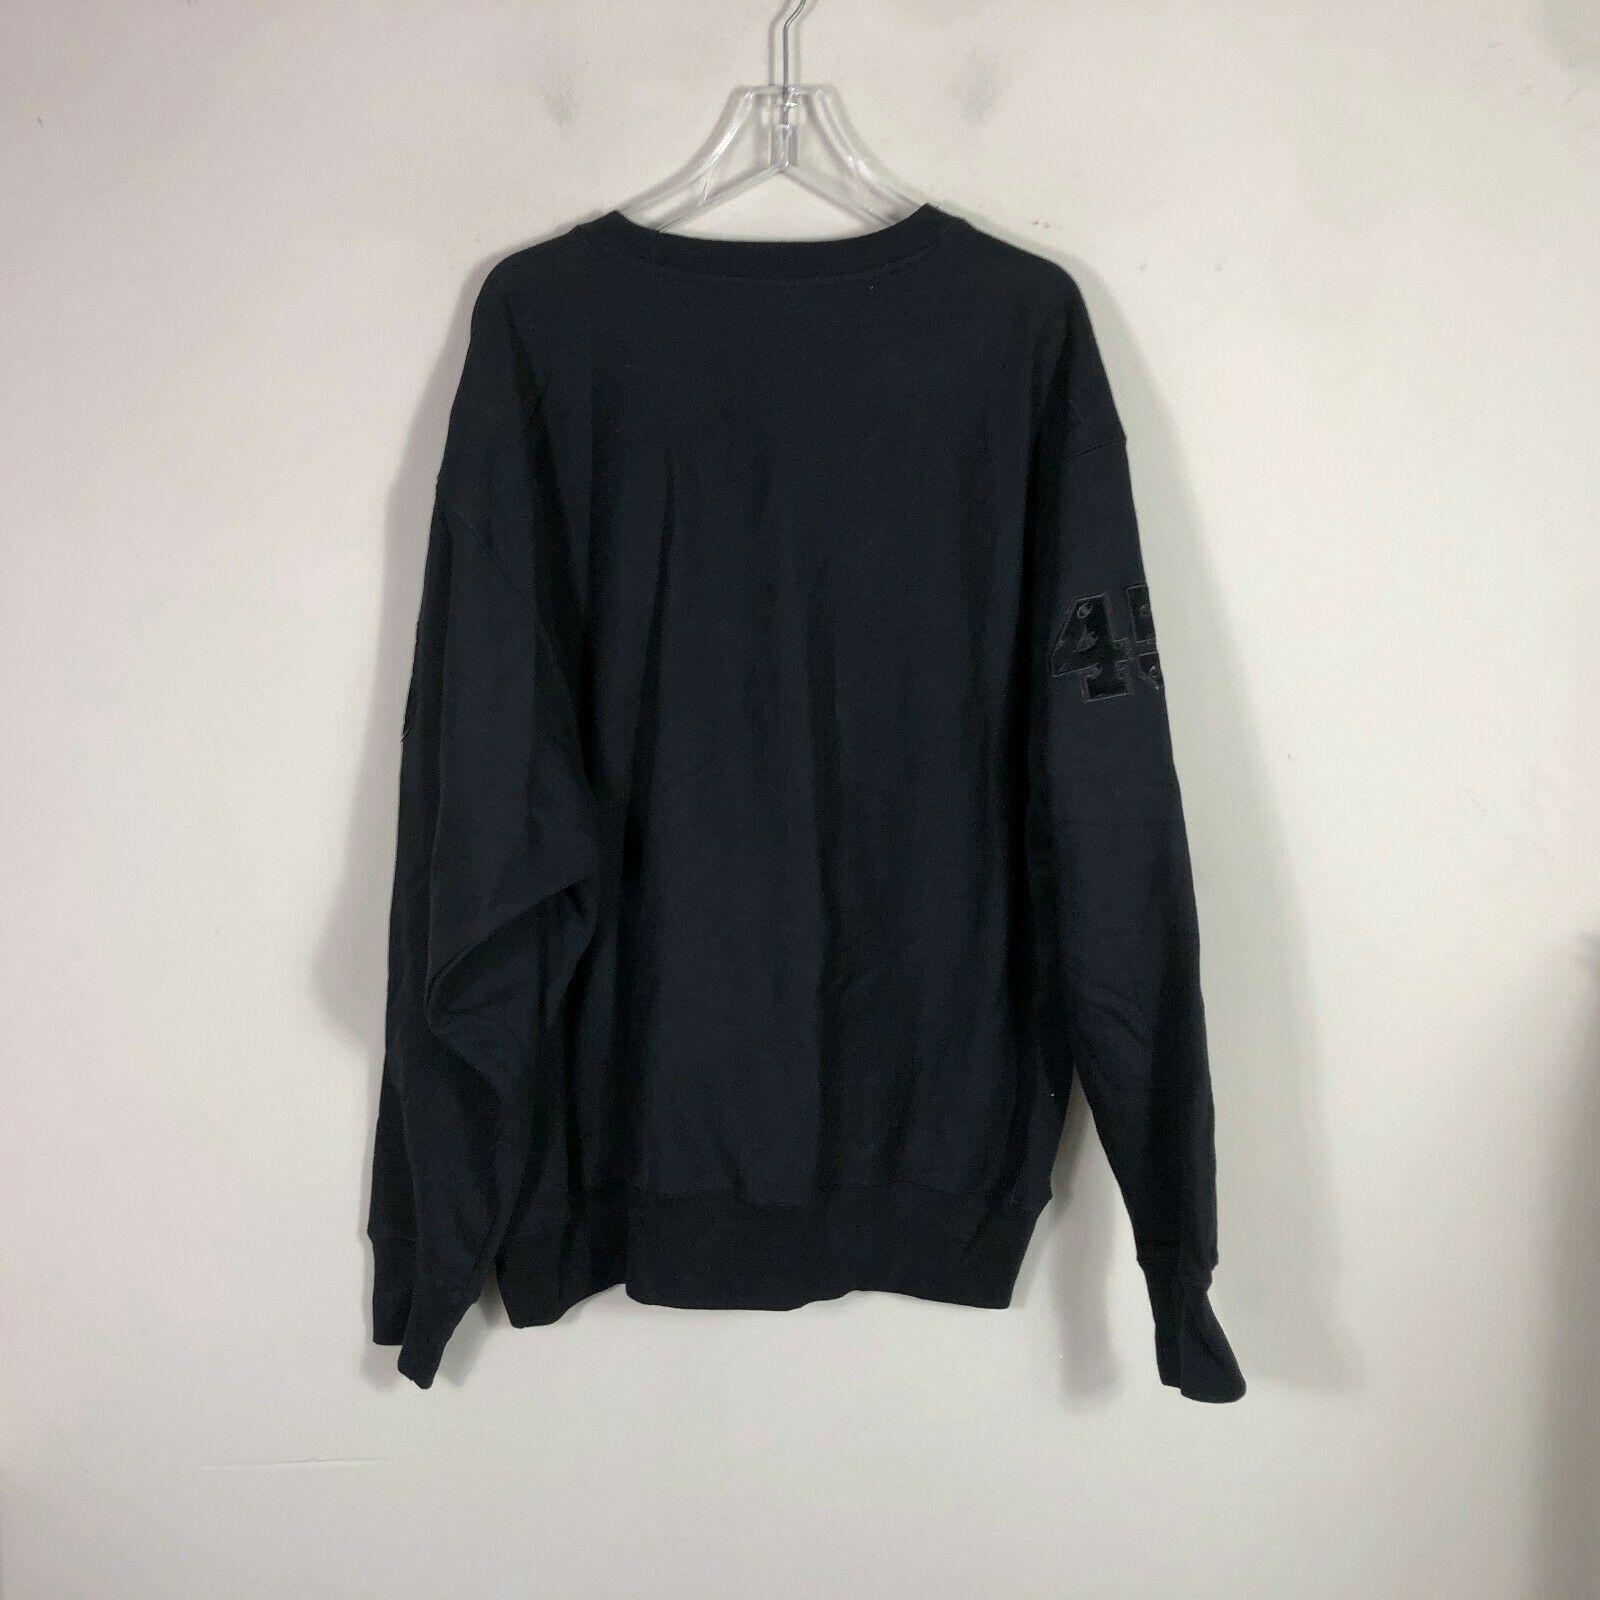 Vintage Champion Crew Neck Reverse Weave Sweatshirt XL NBA NBPA Sweatshirt image 6